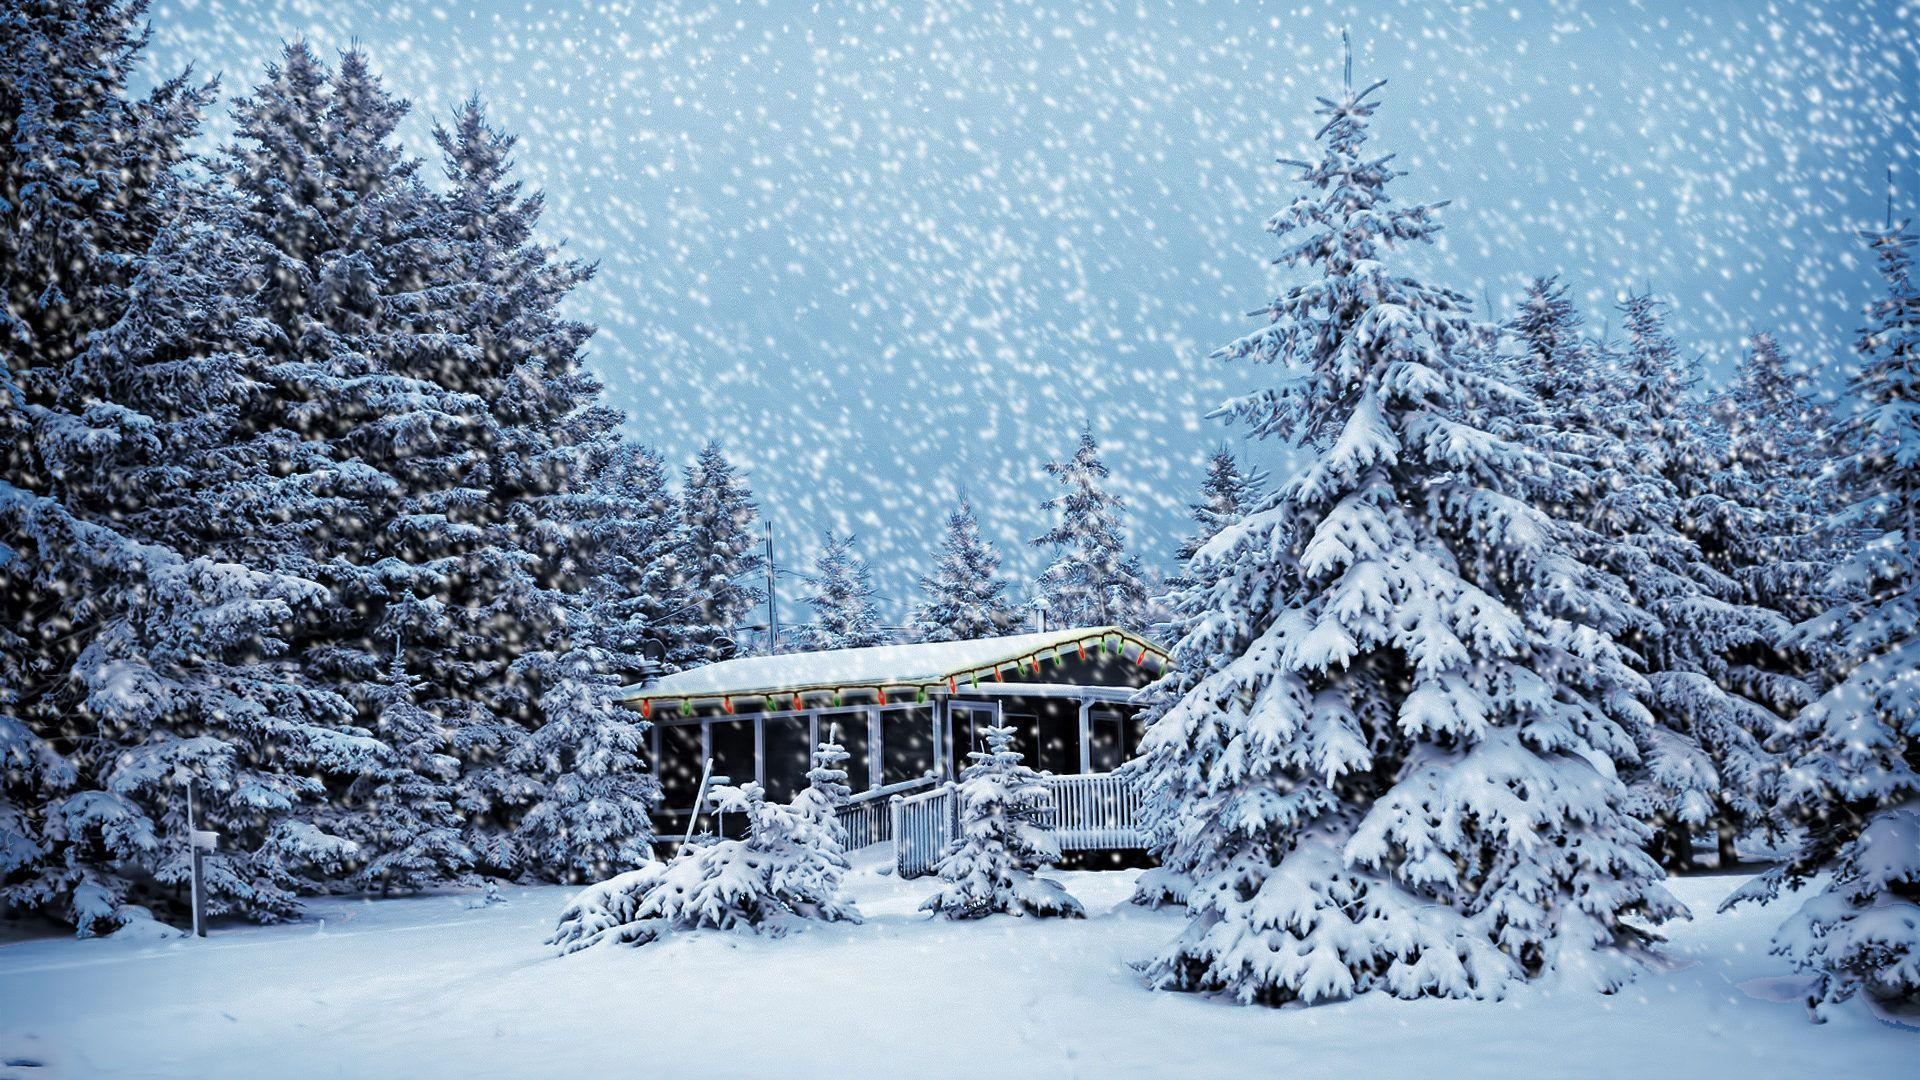 Christmas Snow Scene Wallpapers 1920x1080